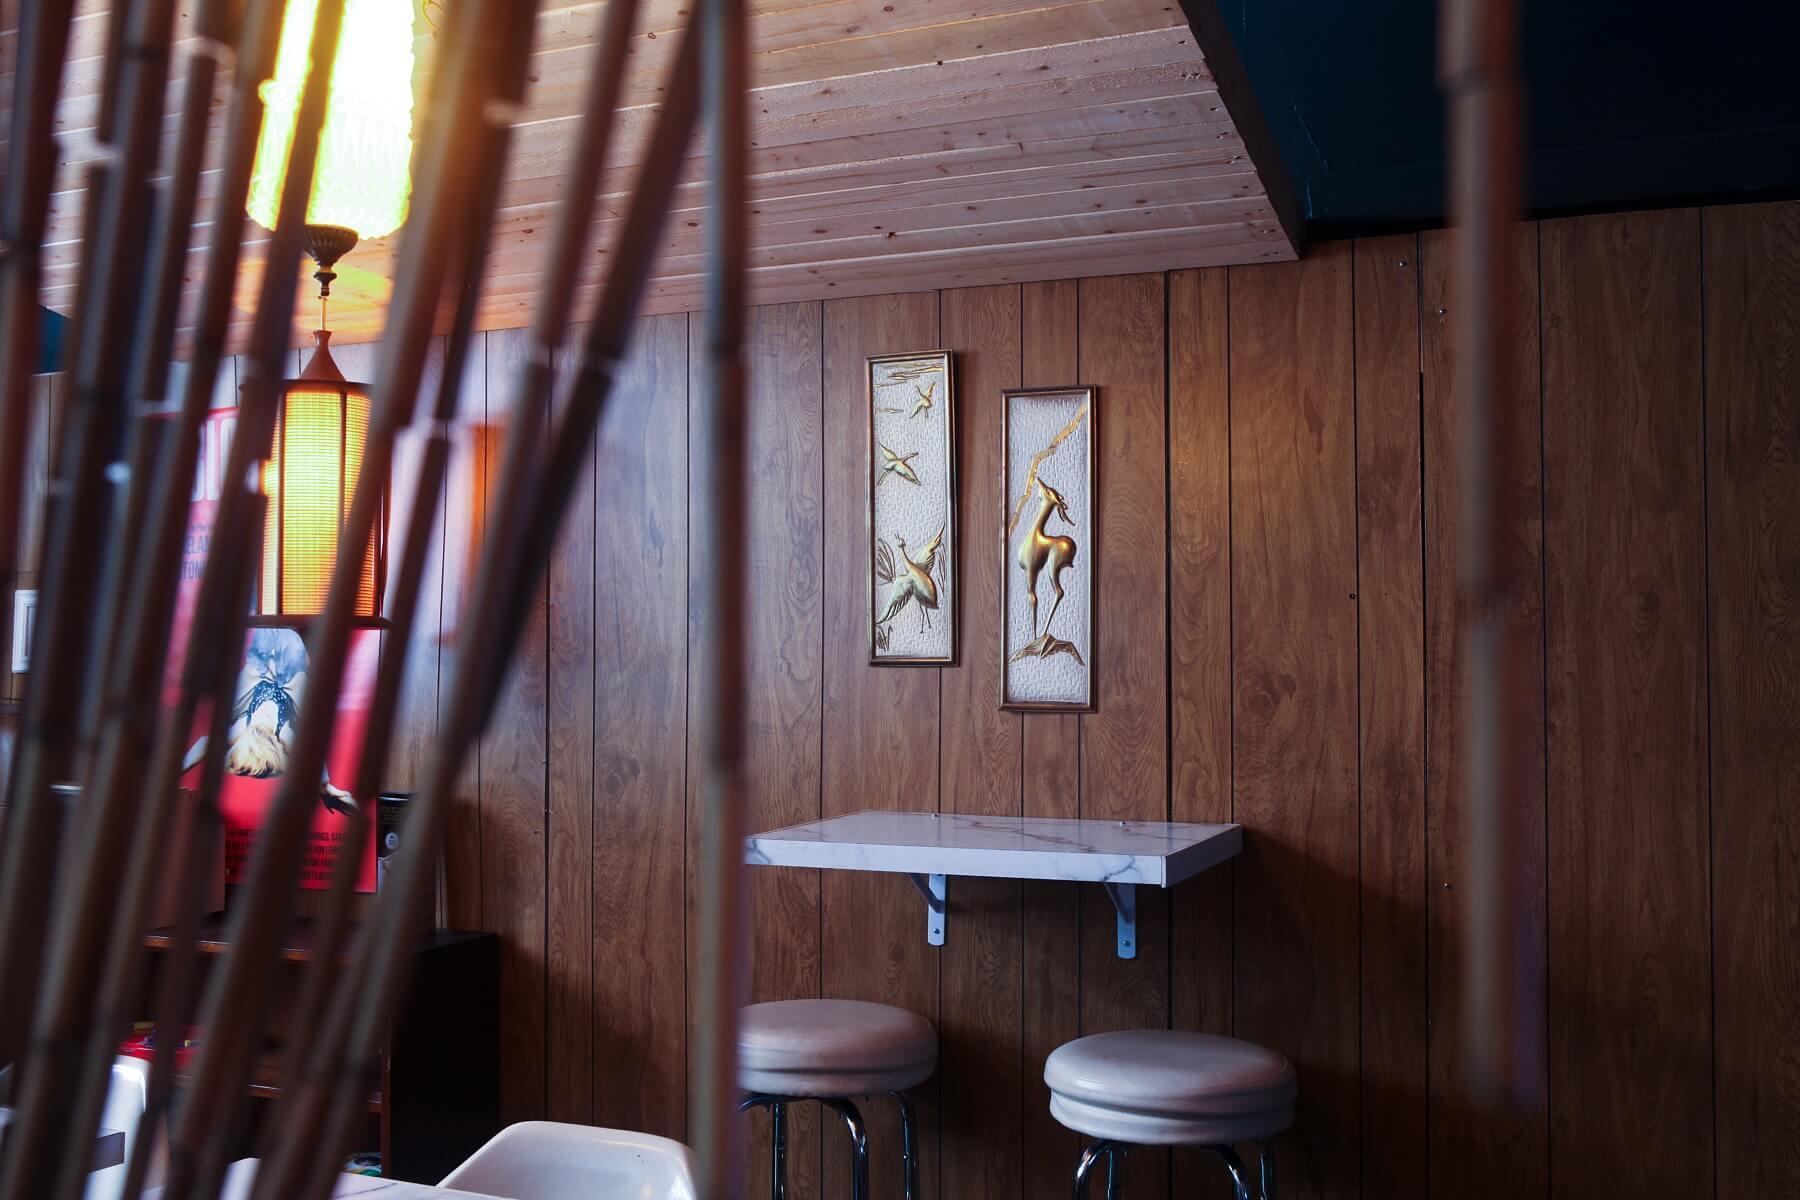 Enter through Angela Davis' head to the tiki lounge, where retro decor and a laid-back vibe set the tone.